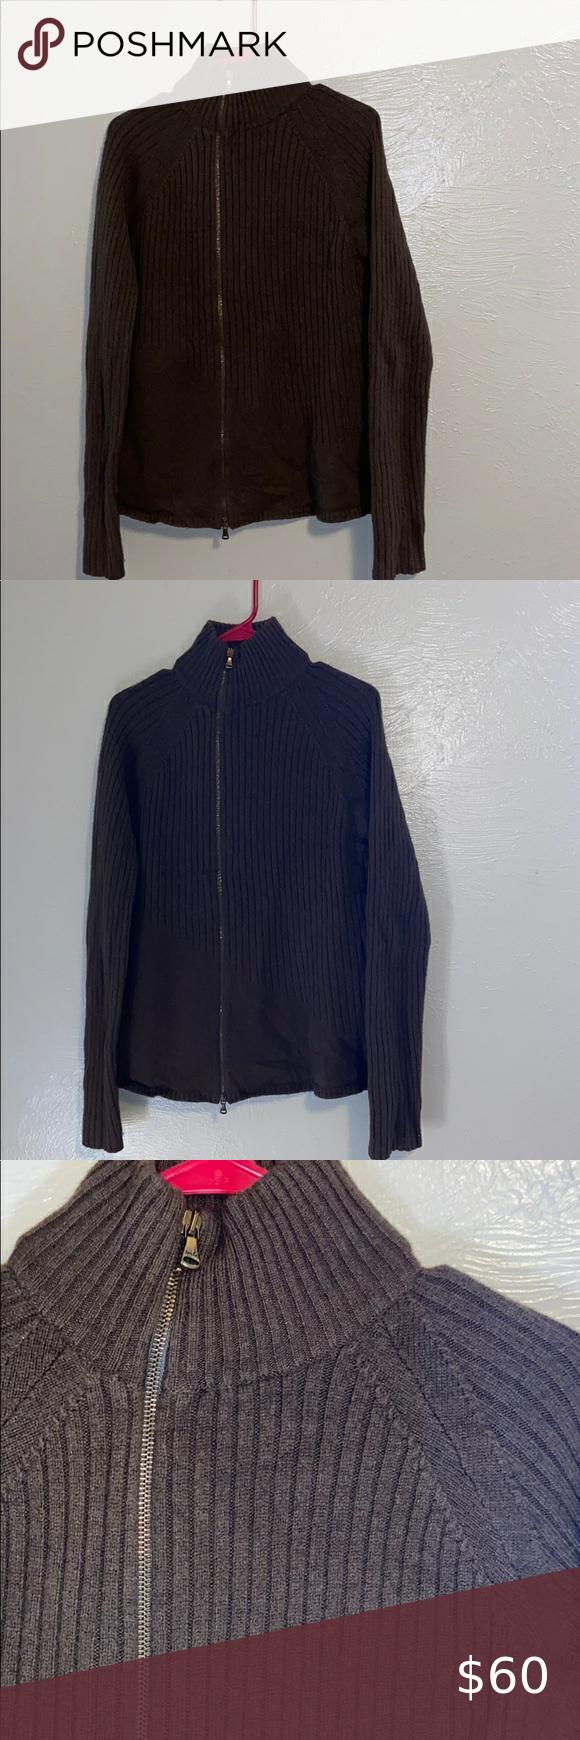 Dolce And Gabbana Sweater